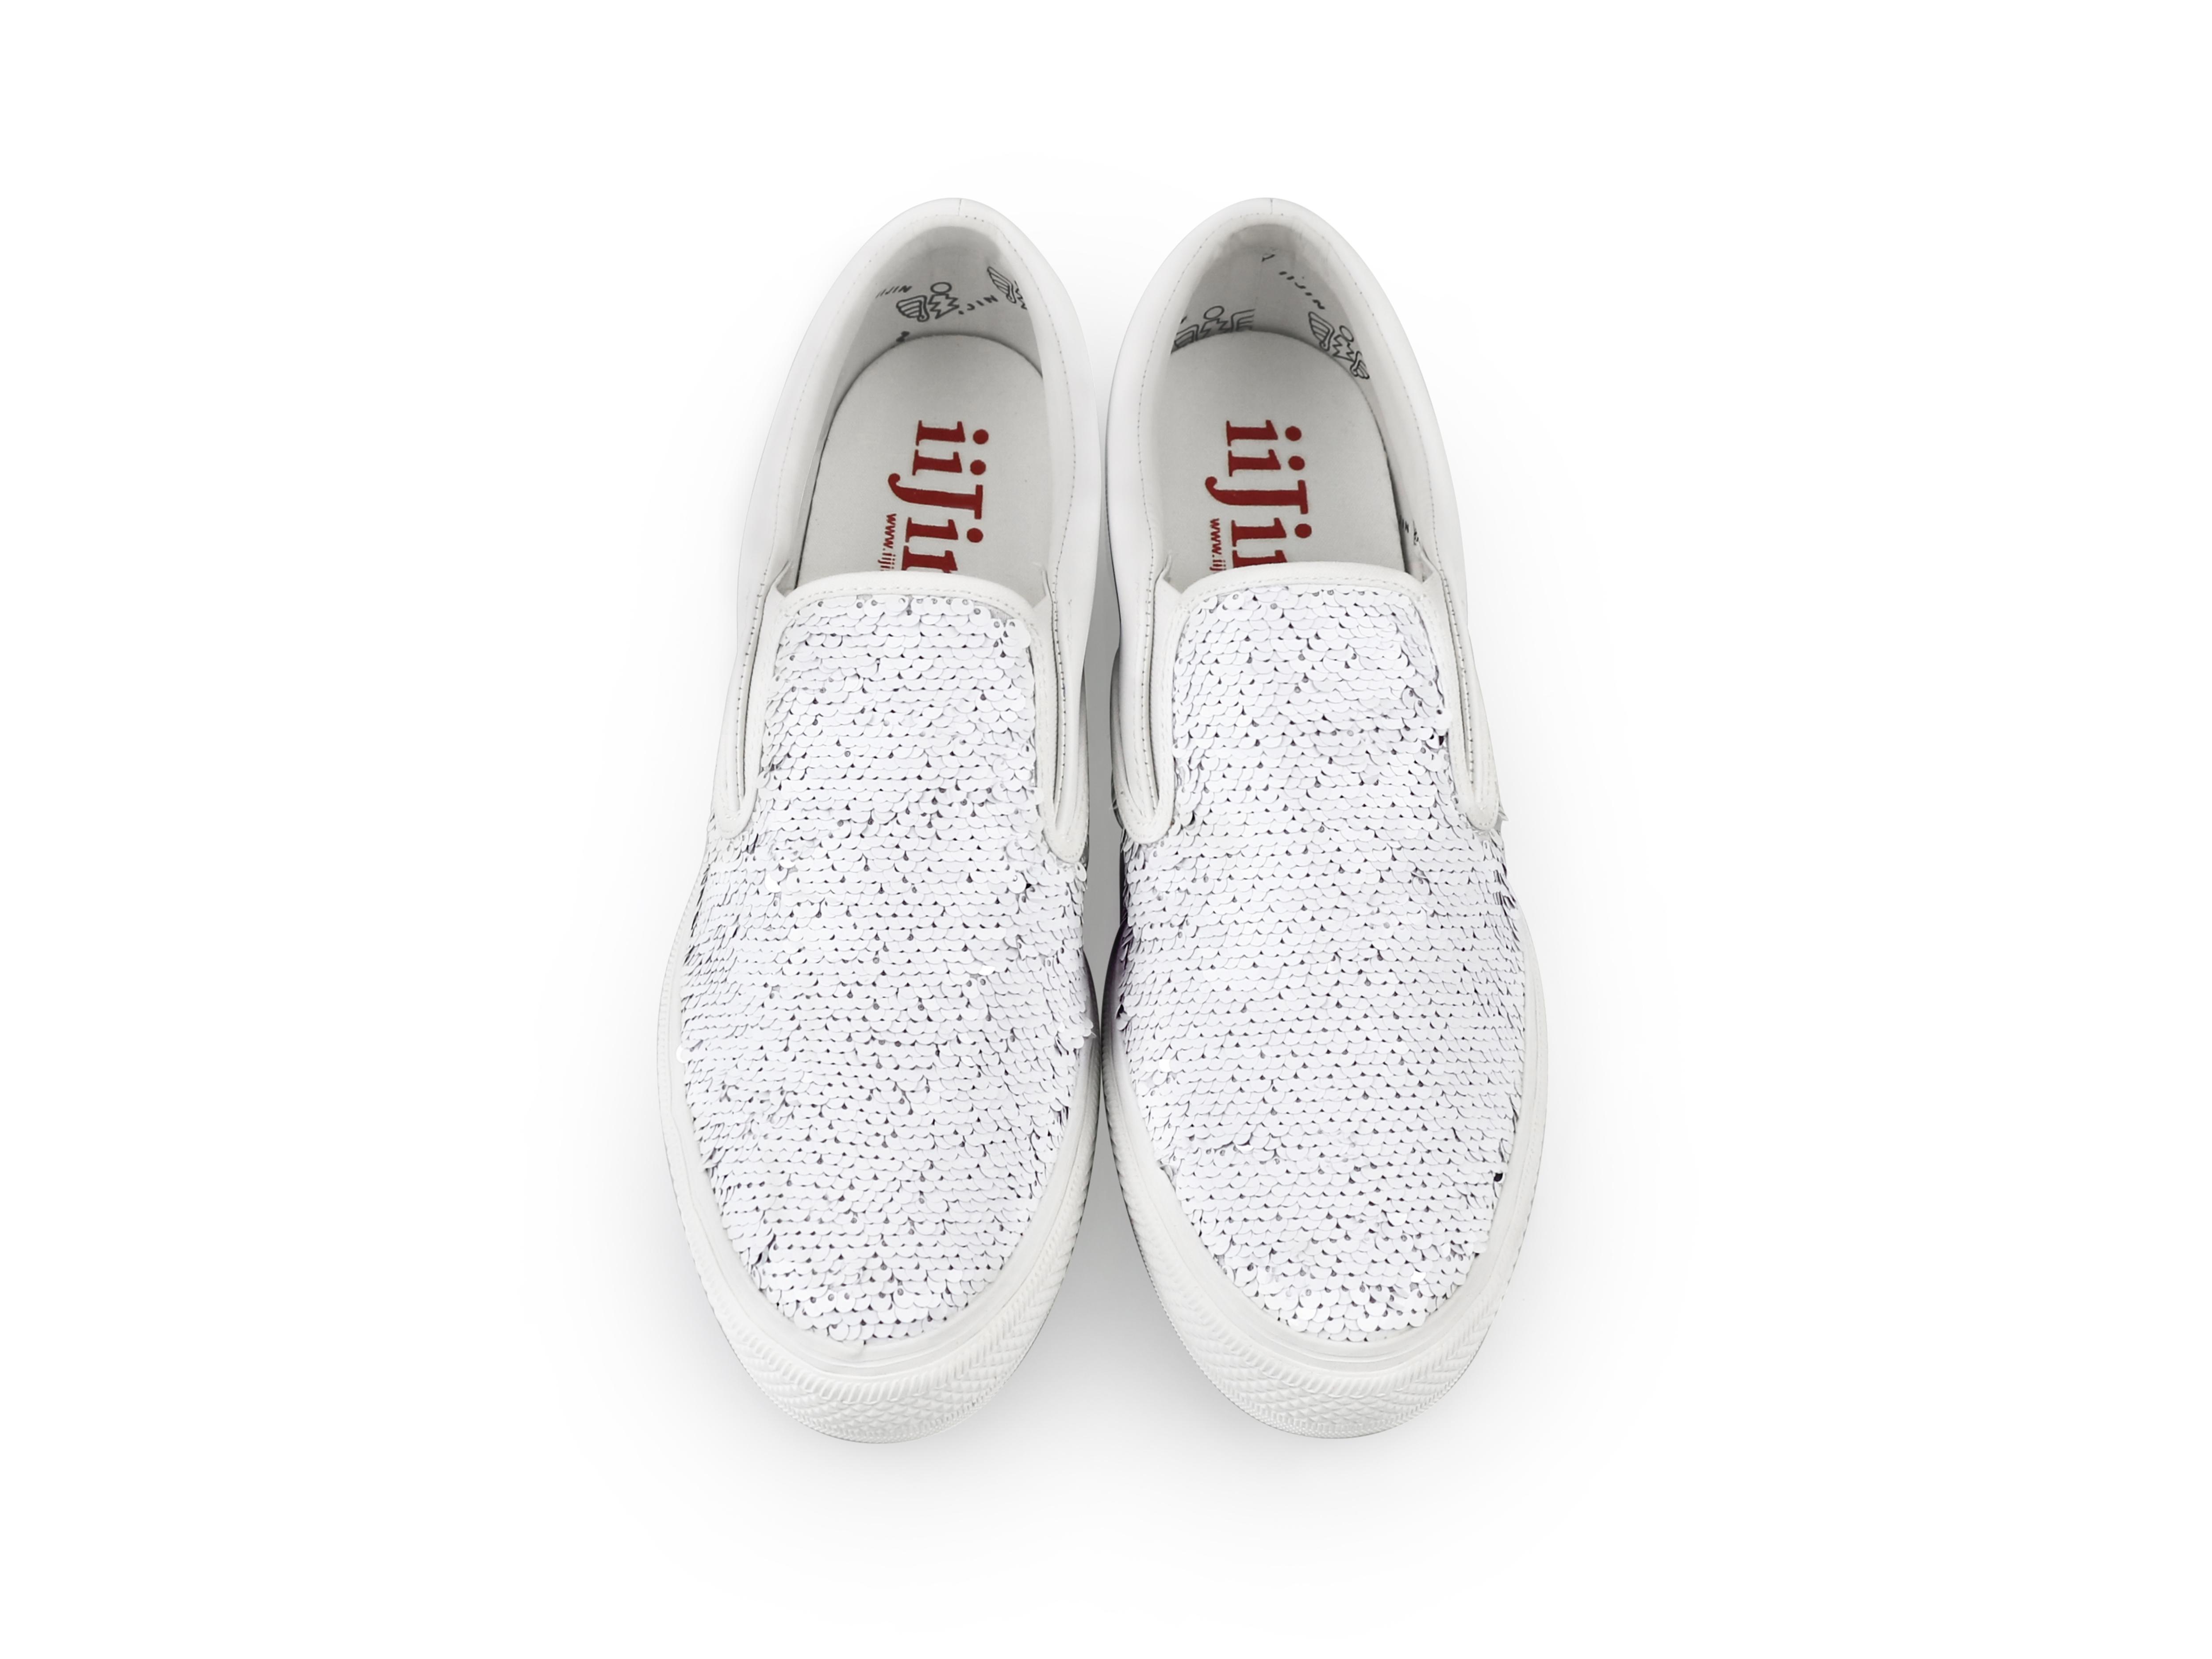 white sequined s slip on iijin tennis shoes